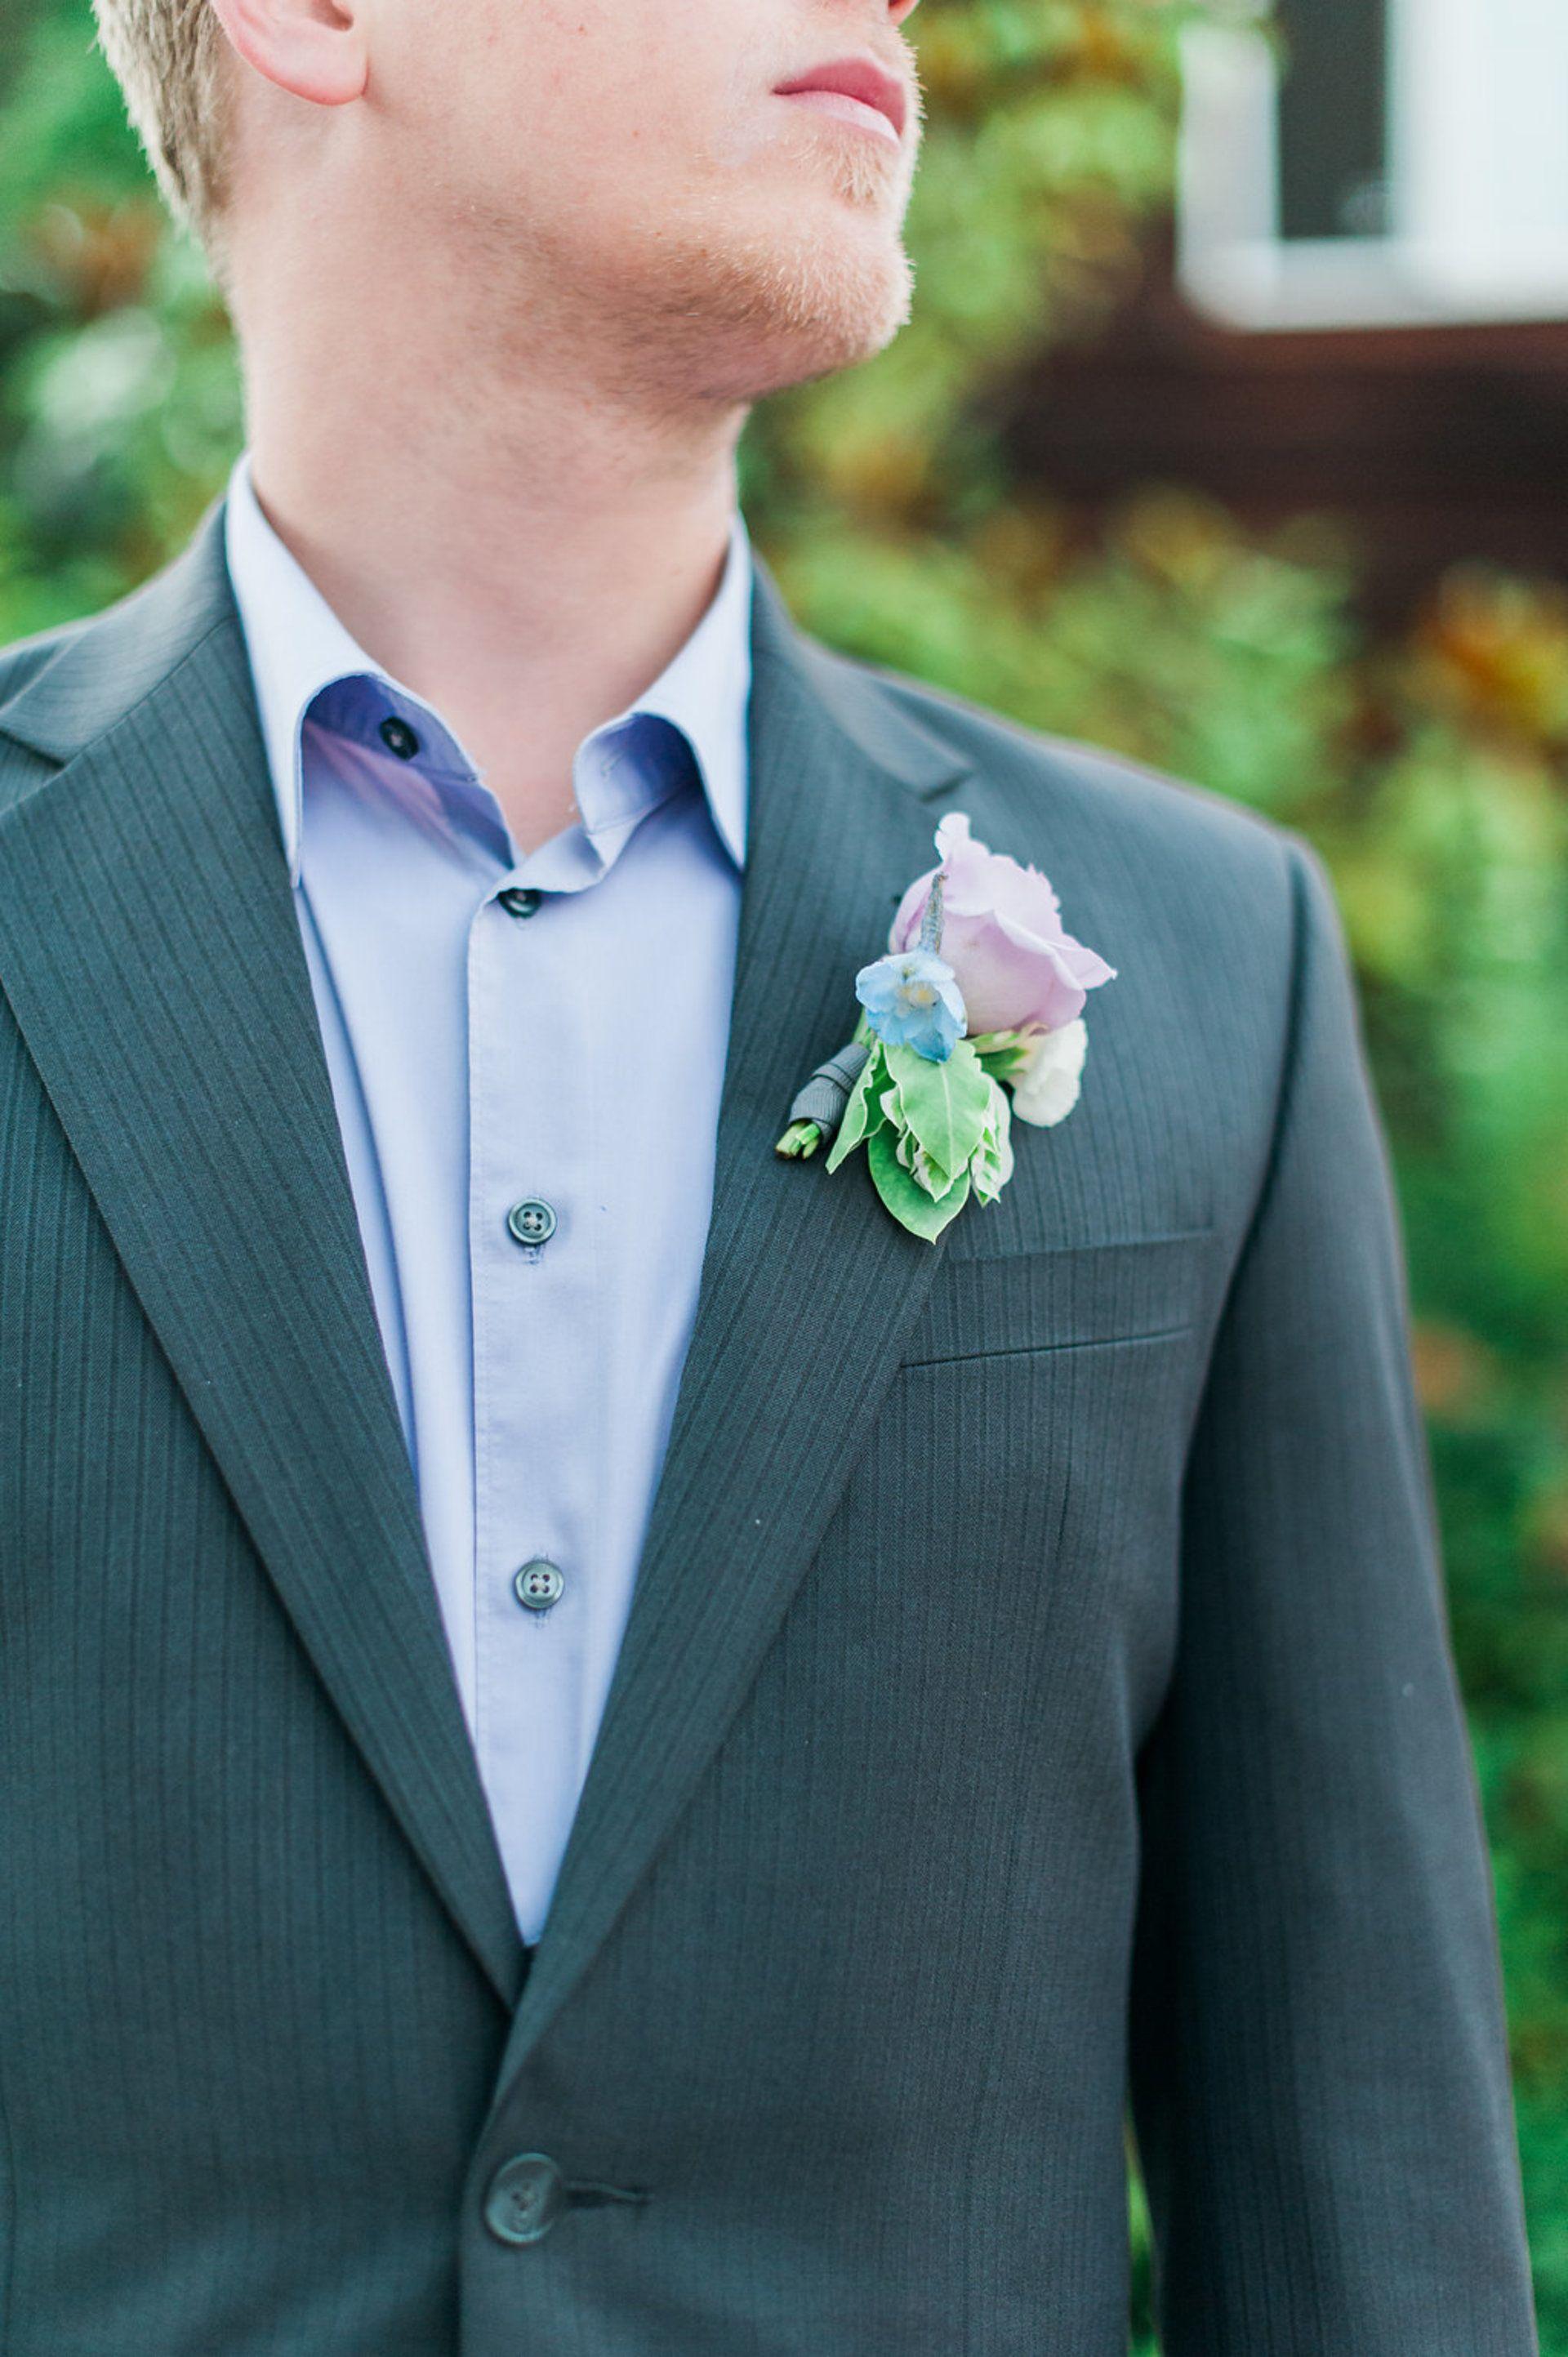 The Smarter Way to Wed   Seattle wedding, Spring weddings and Wedding